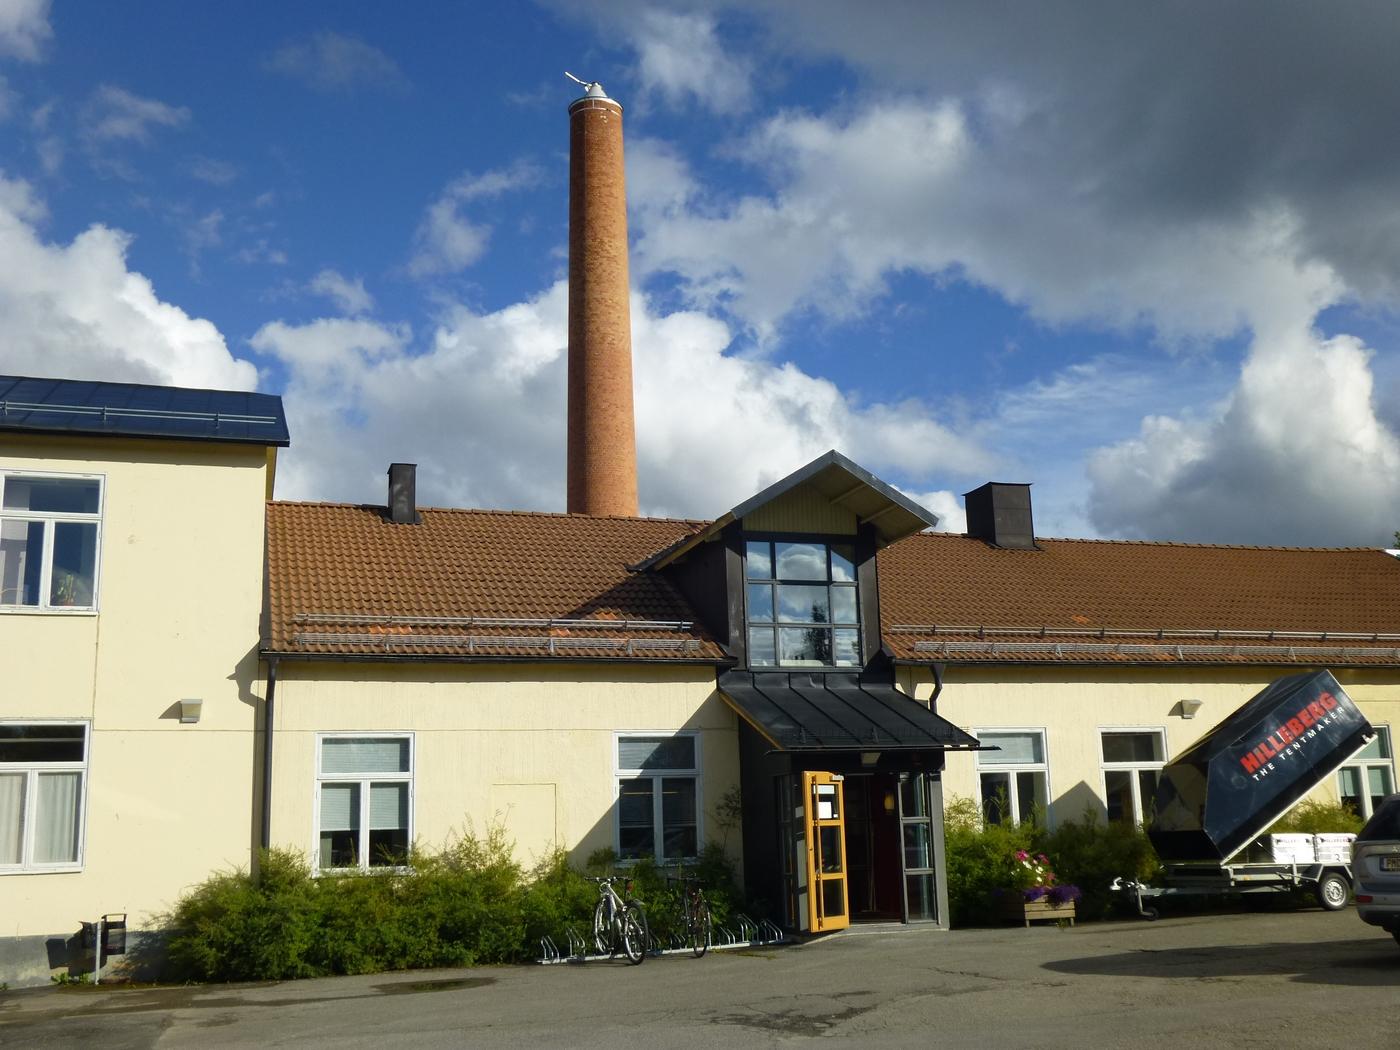 Siège social d'Hilleberg à Frösön en Suède